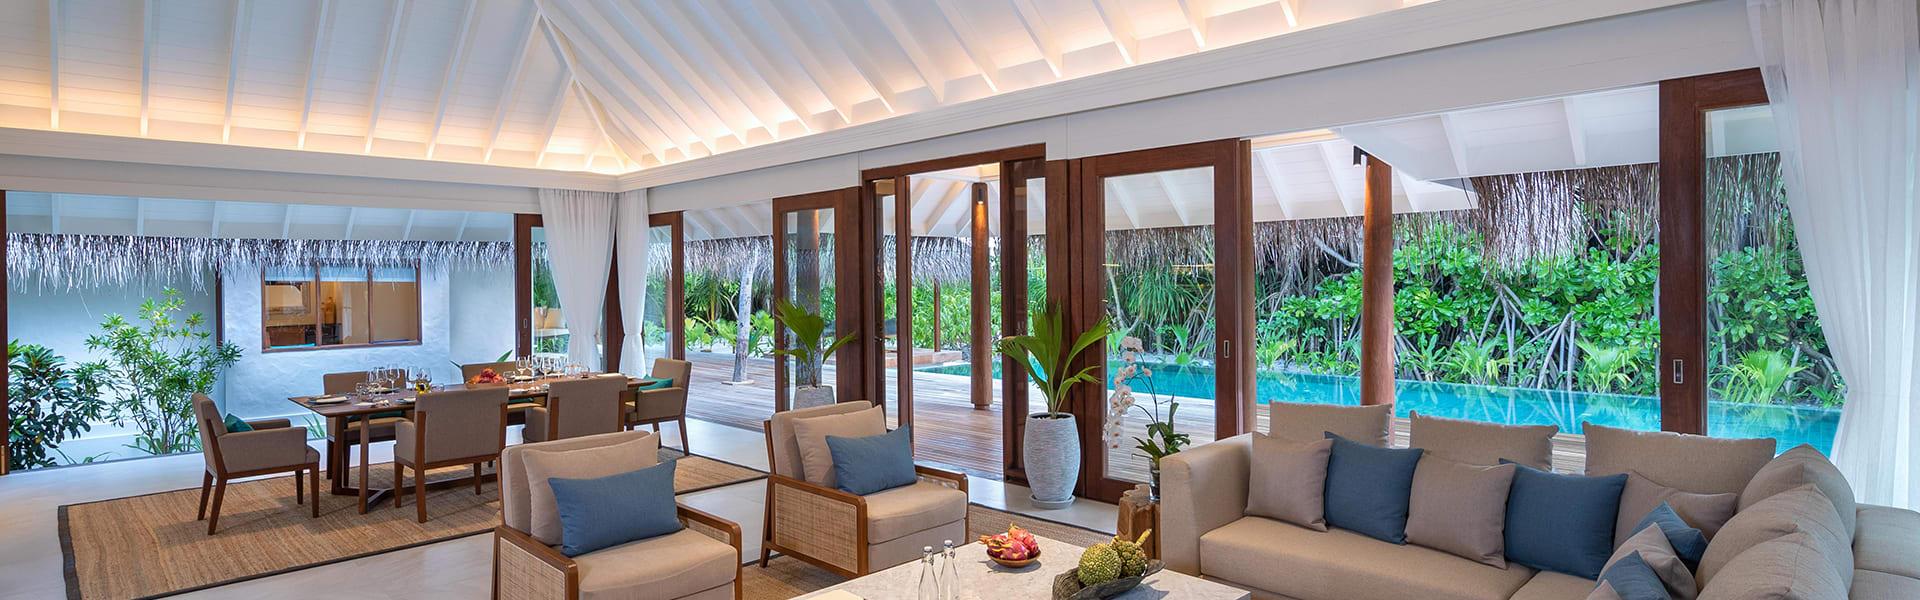 anantara kihavah four bedroom beach pool residence lounge area 1920x600 - Home